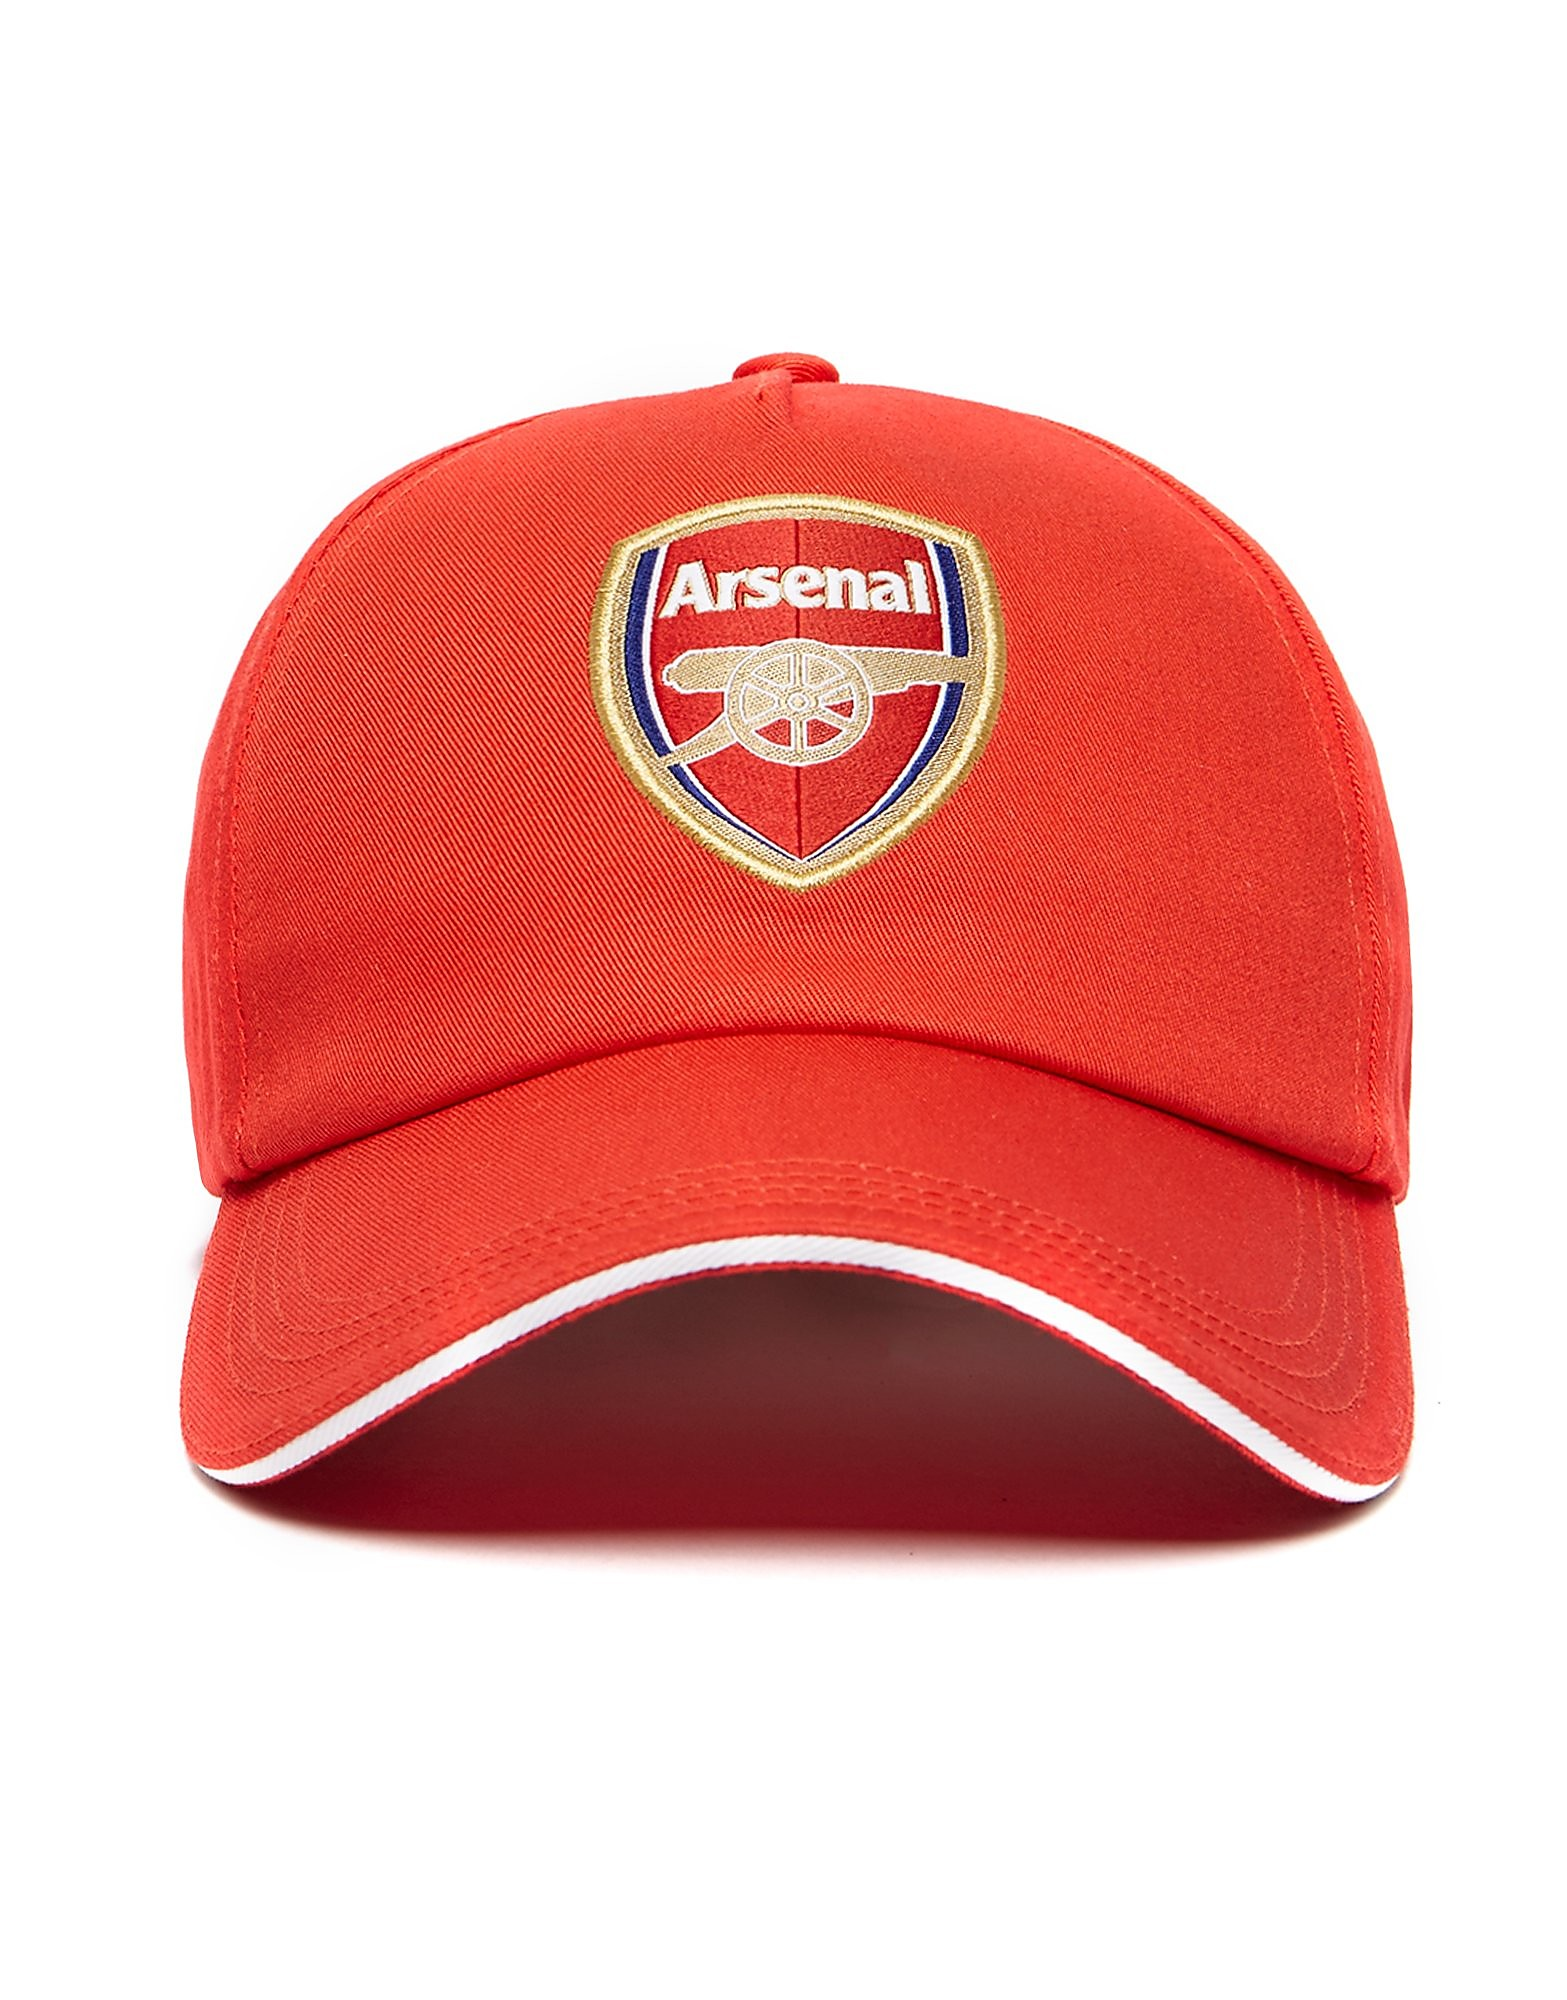 PUMA Arsenal Cap